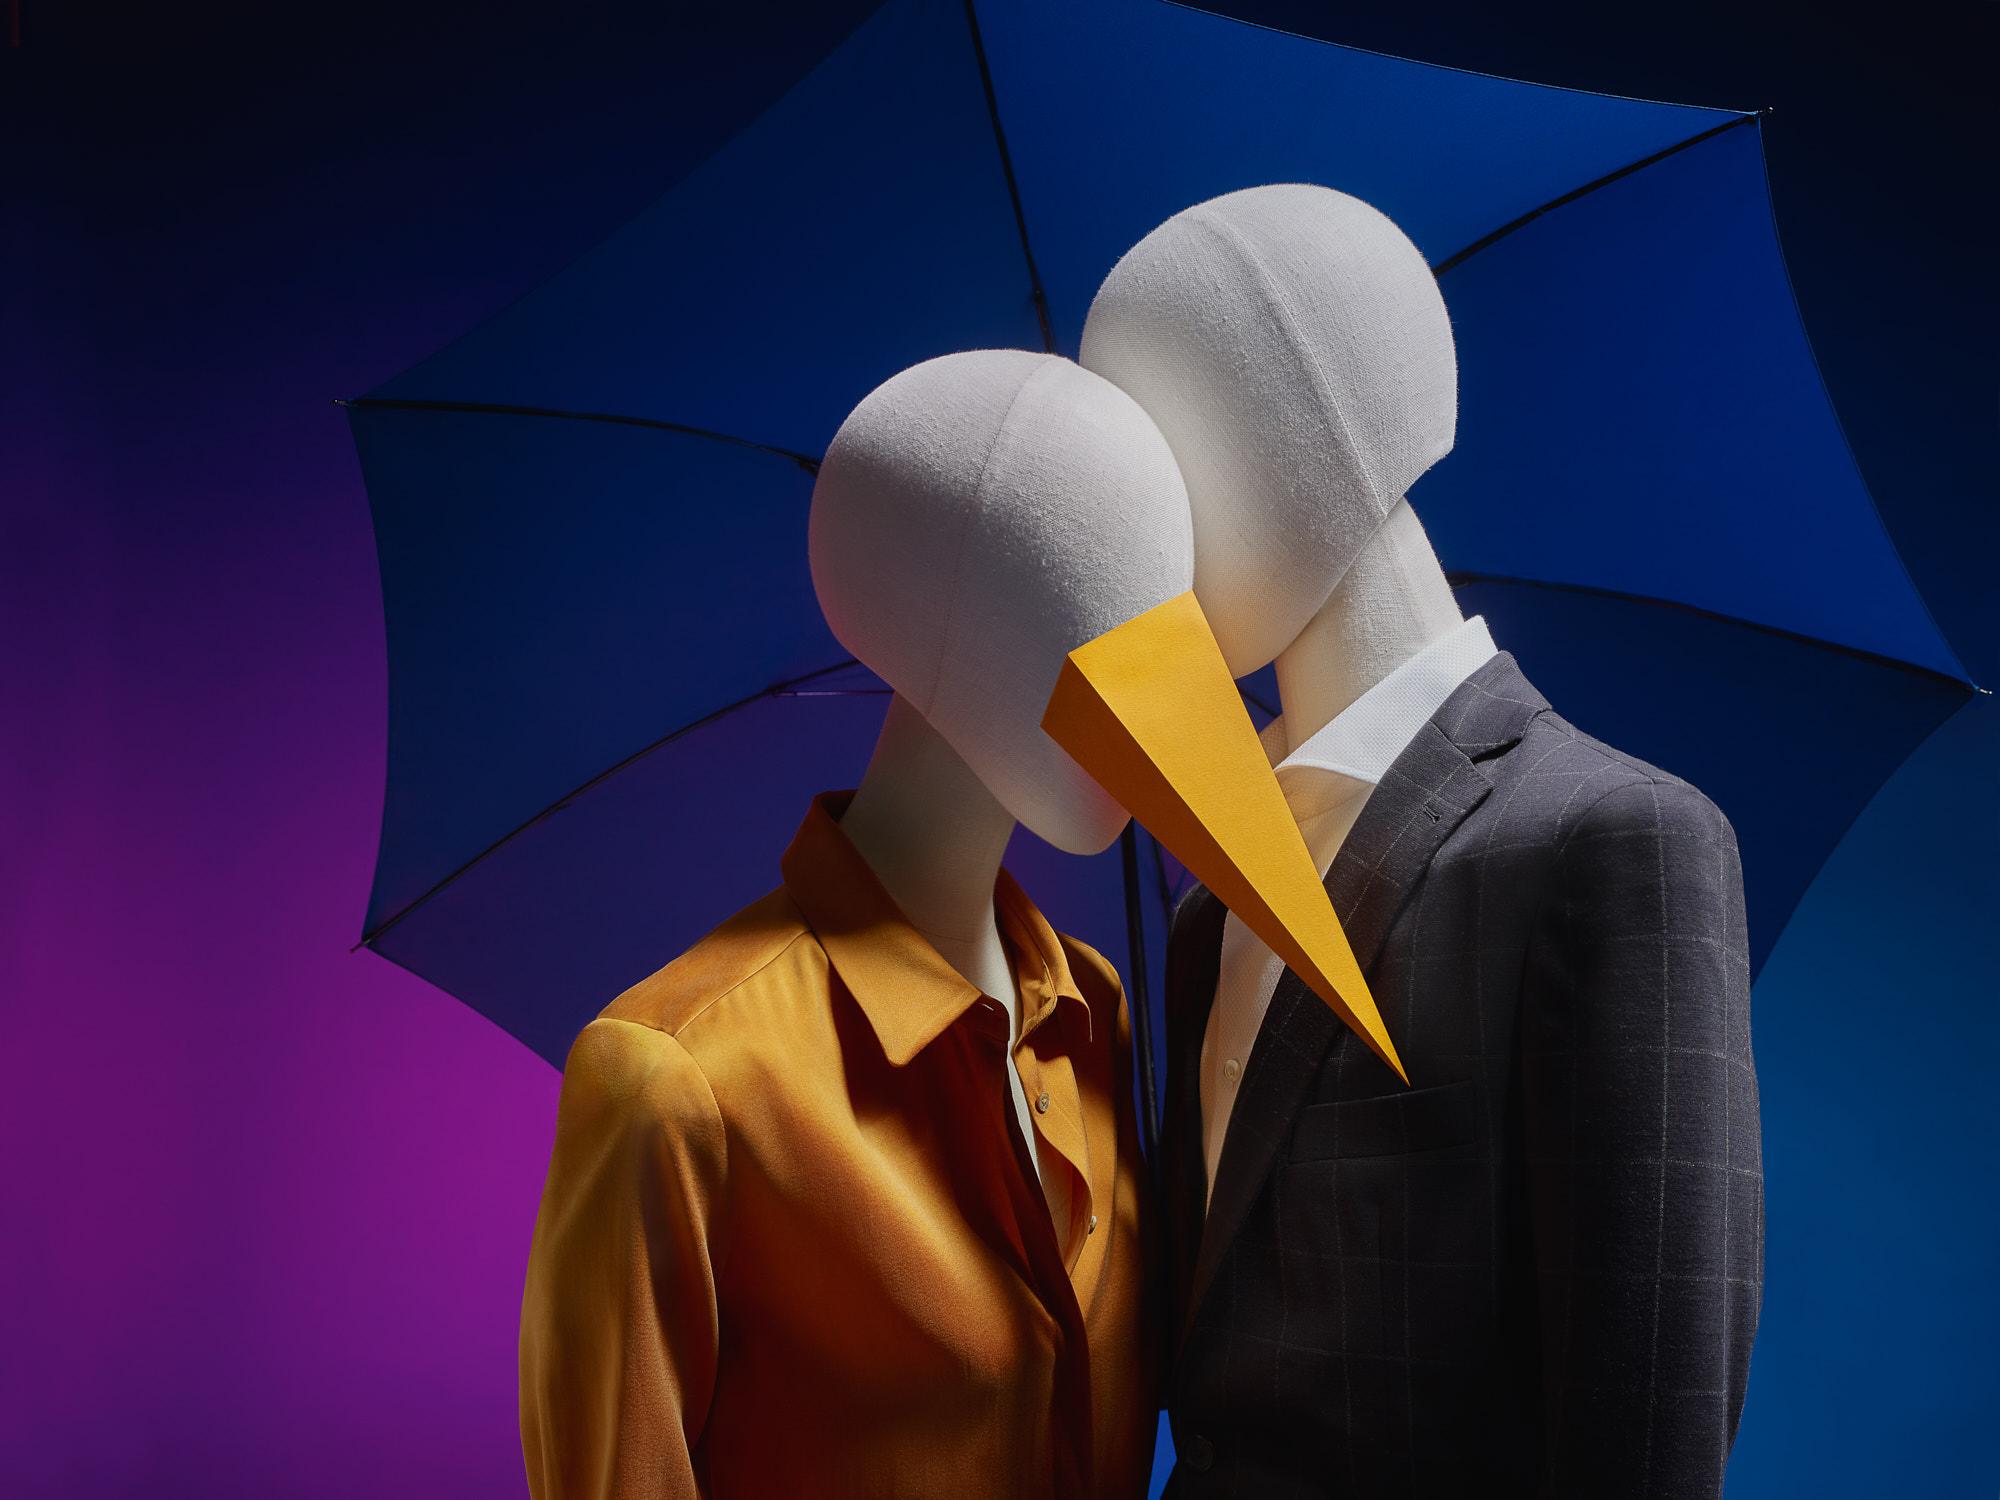 bernd-westphal-stillstars-vanlaack-mannequin-fashion-still-life-photography-006